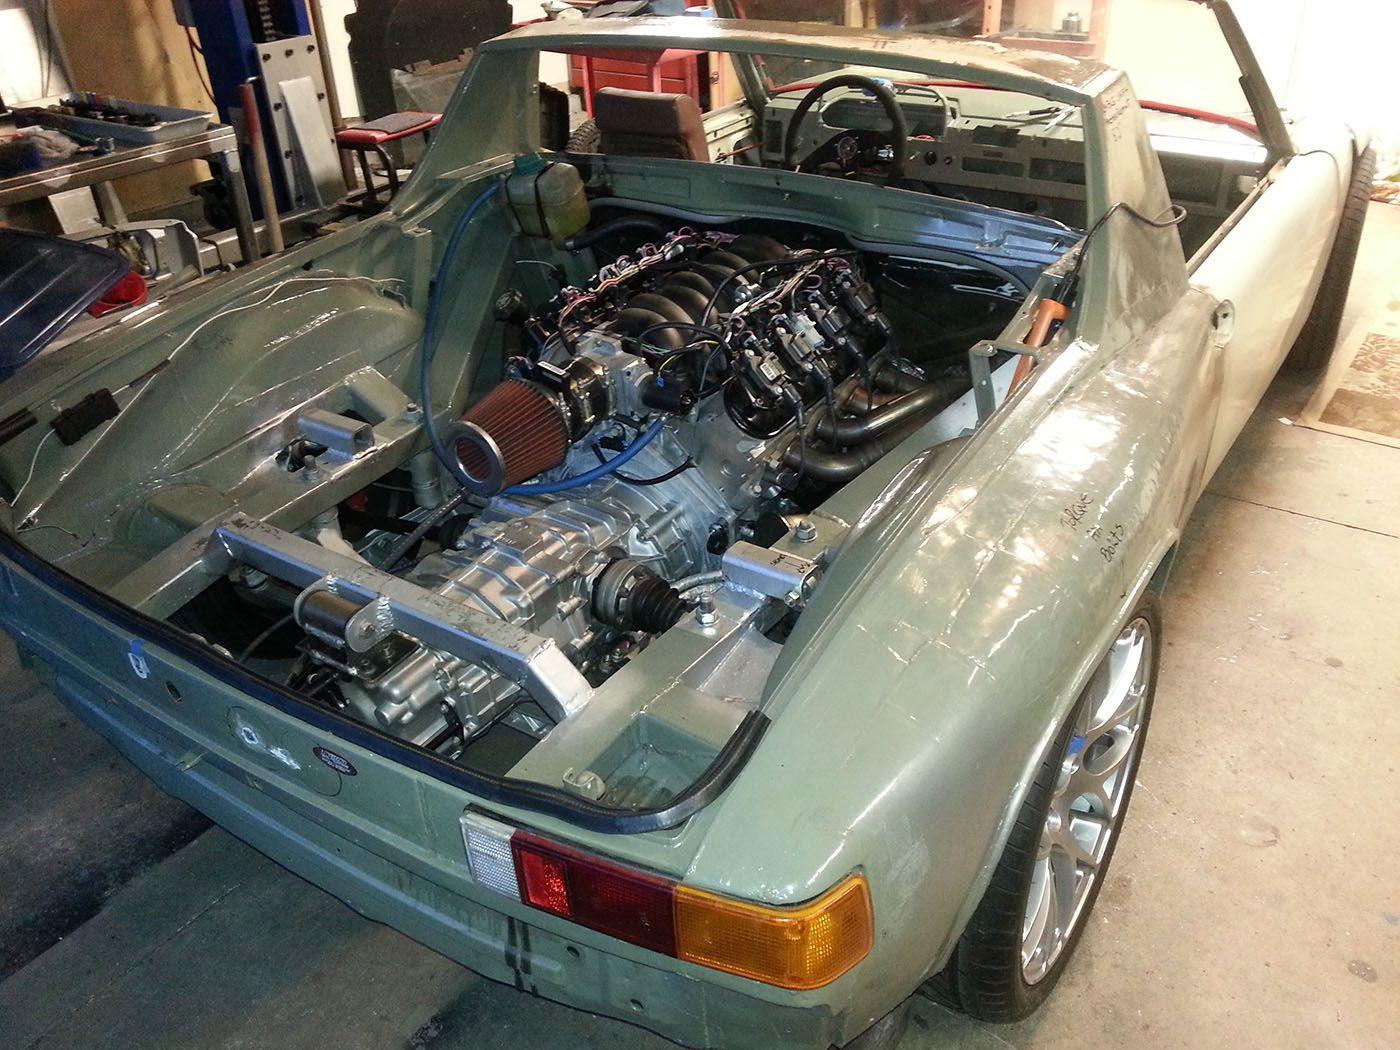 Building A Porsche 914 With A Ls6 Porsche 914 Porsche